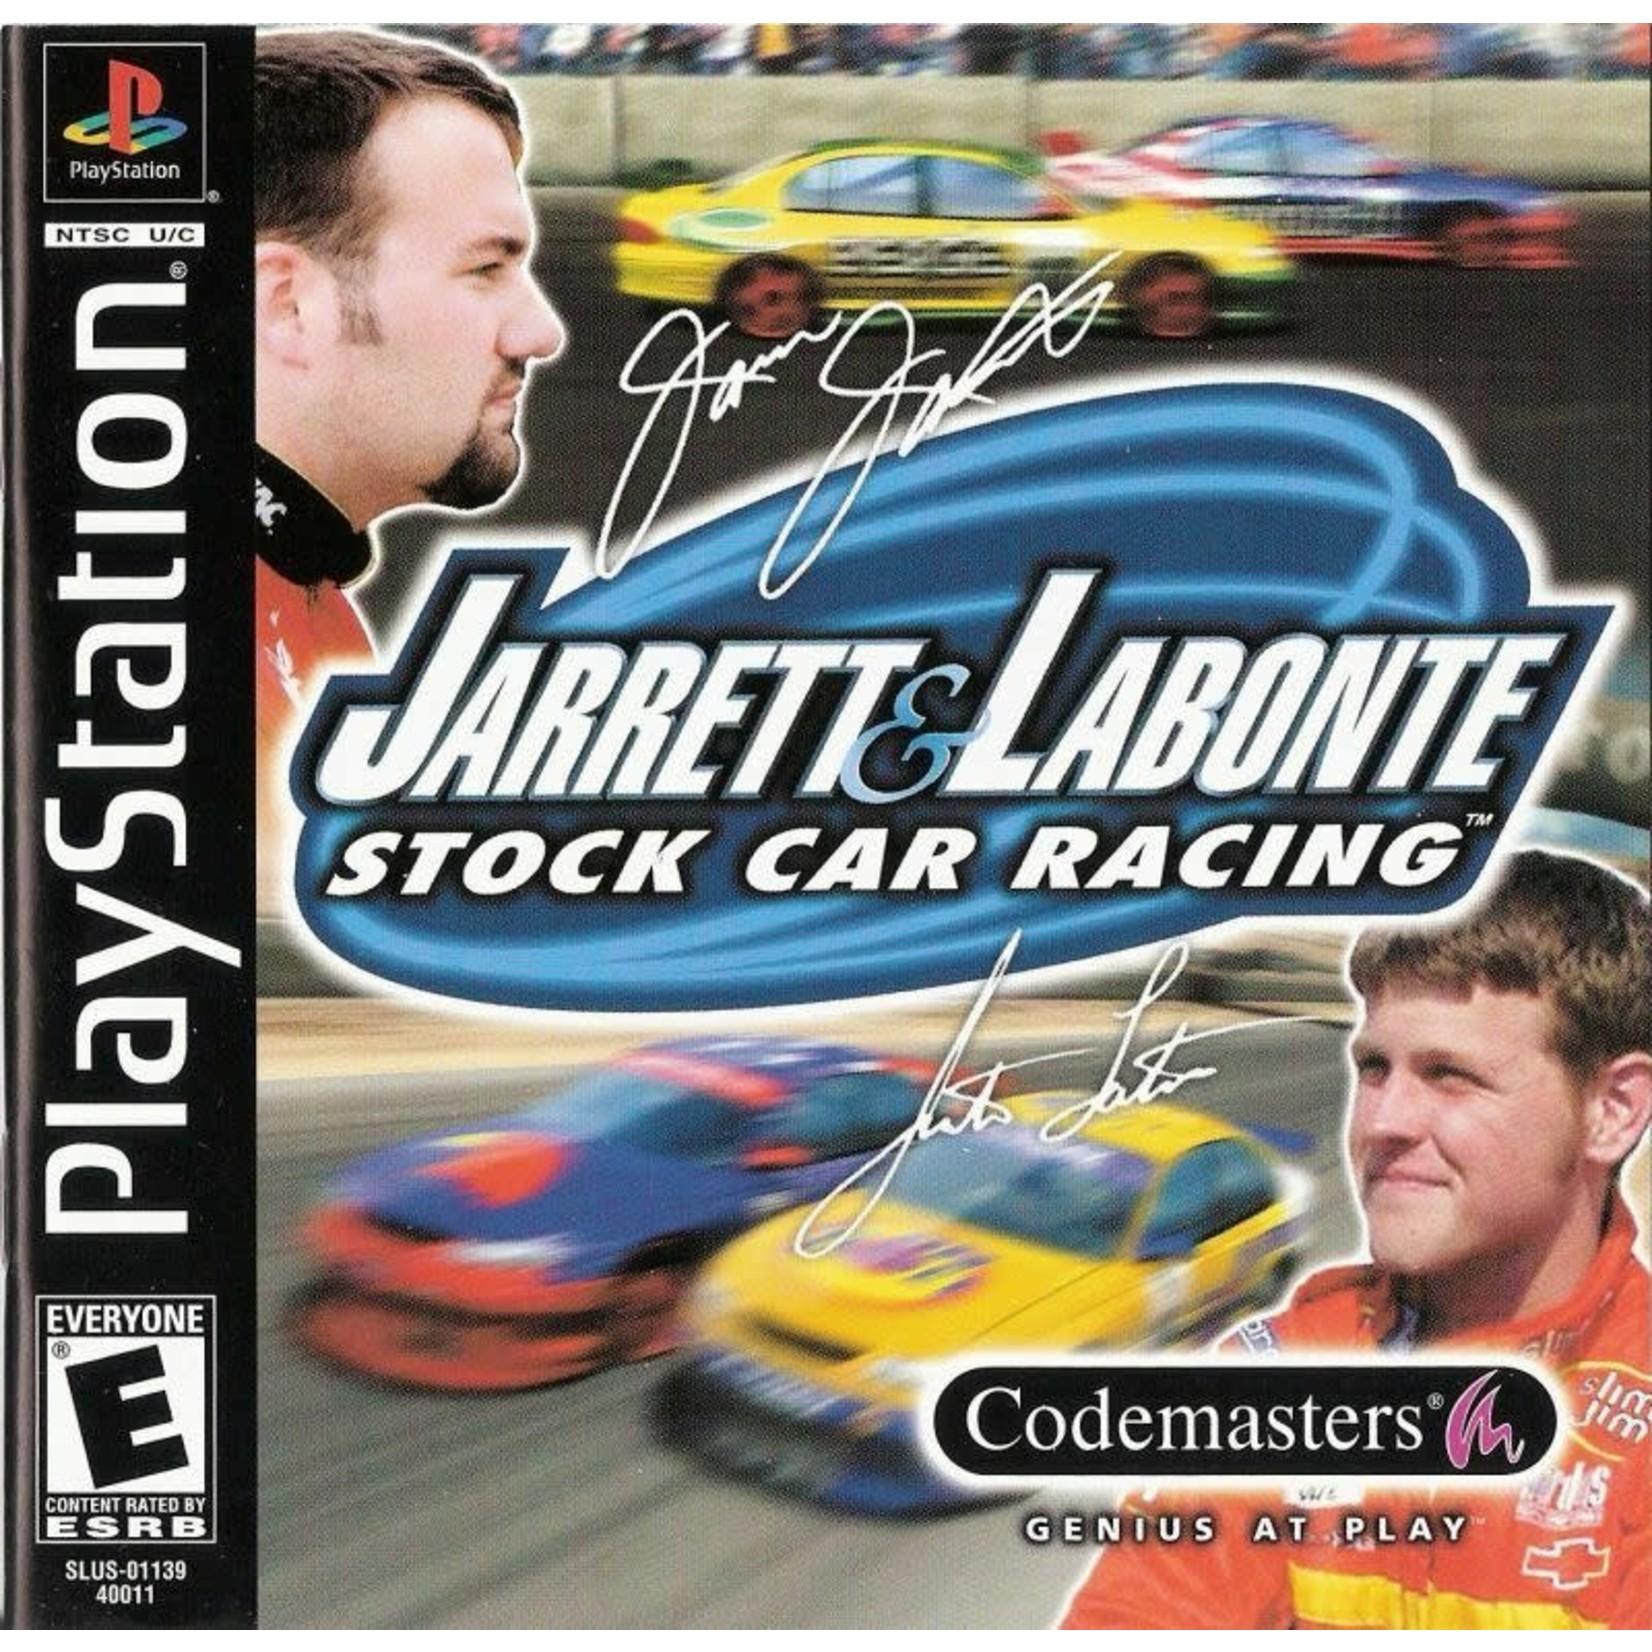 PS1U-Jarret And Labonte Stock Car Racing